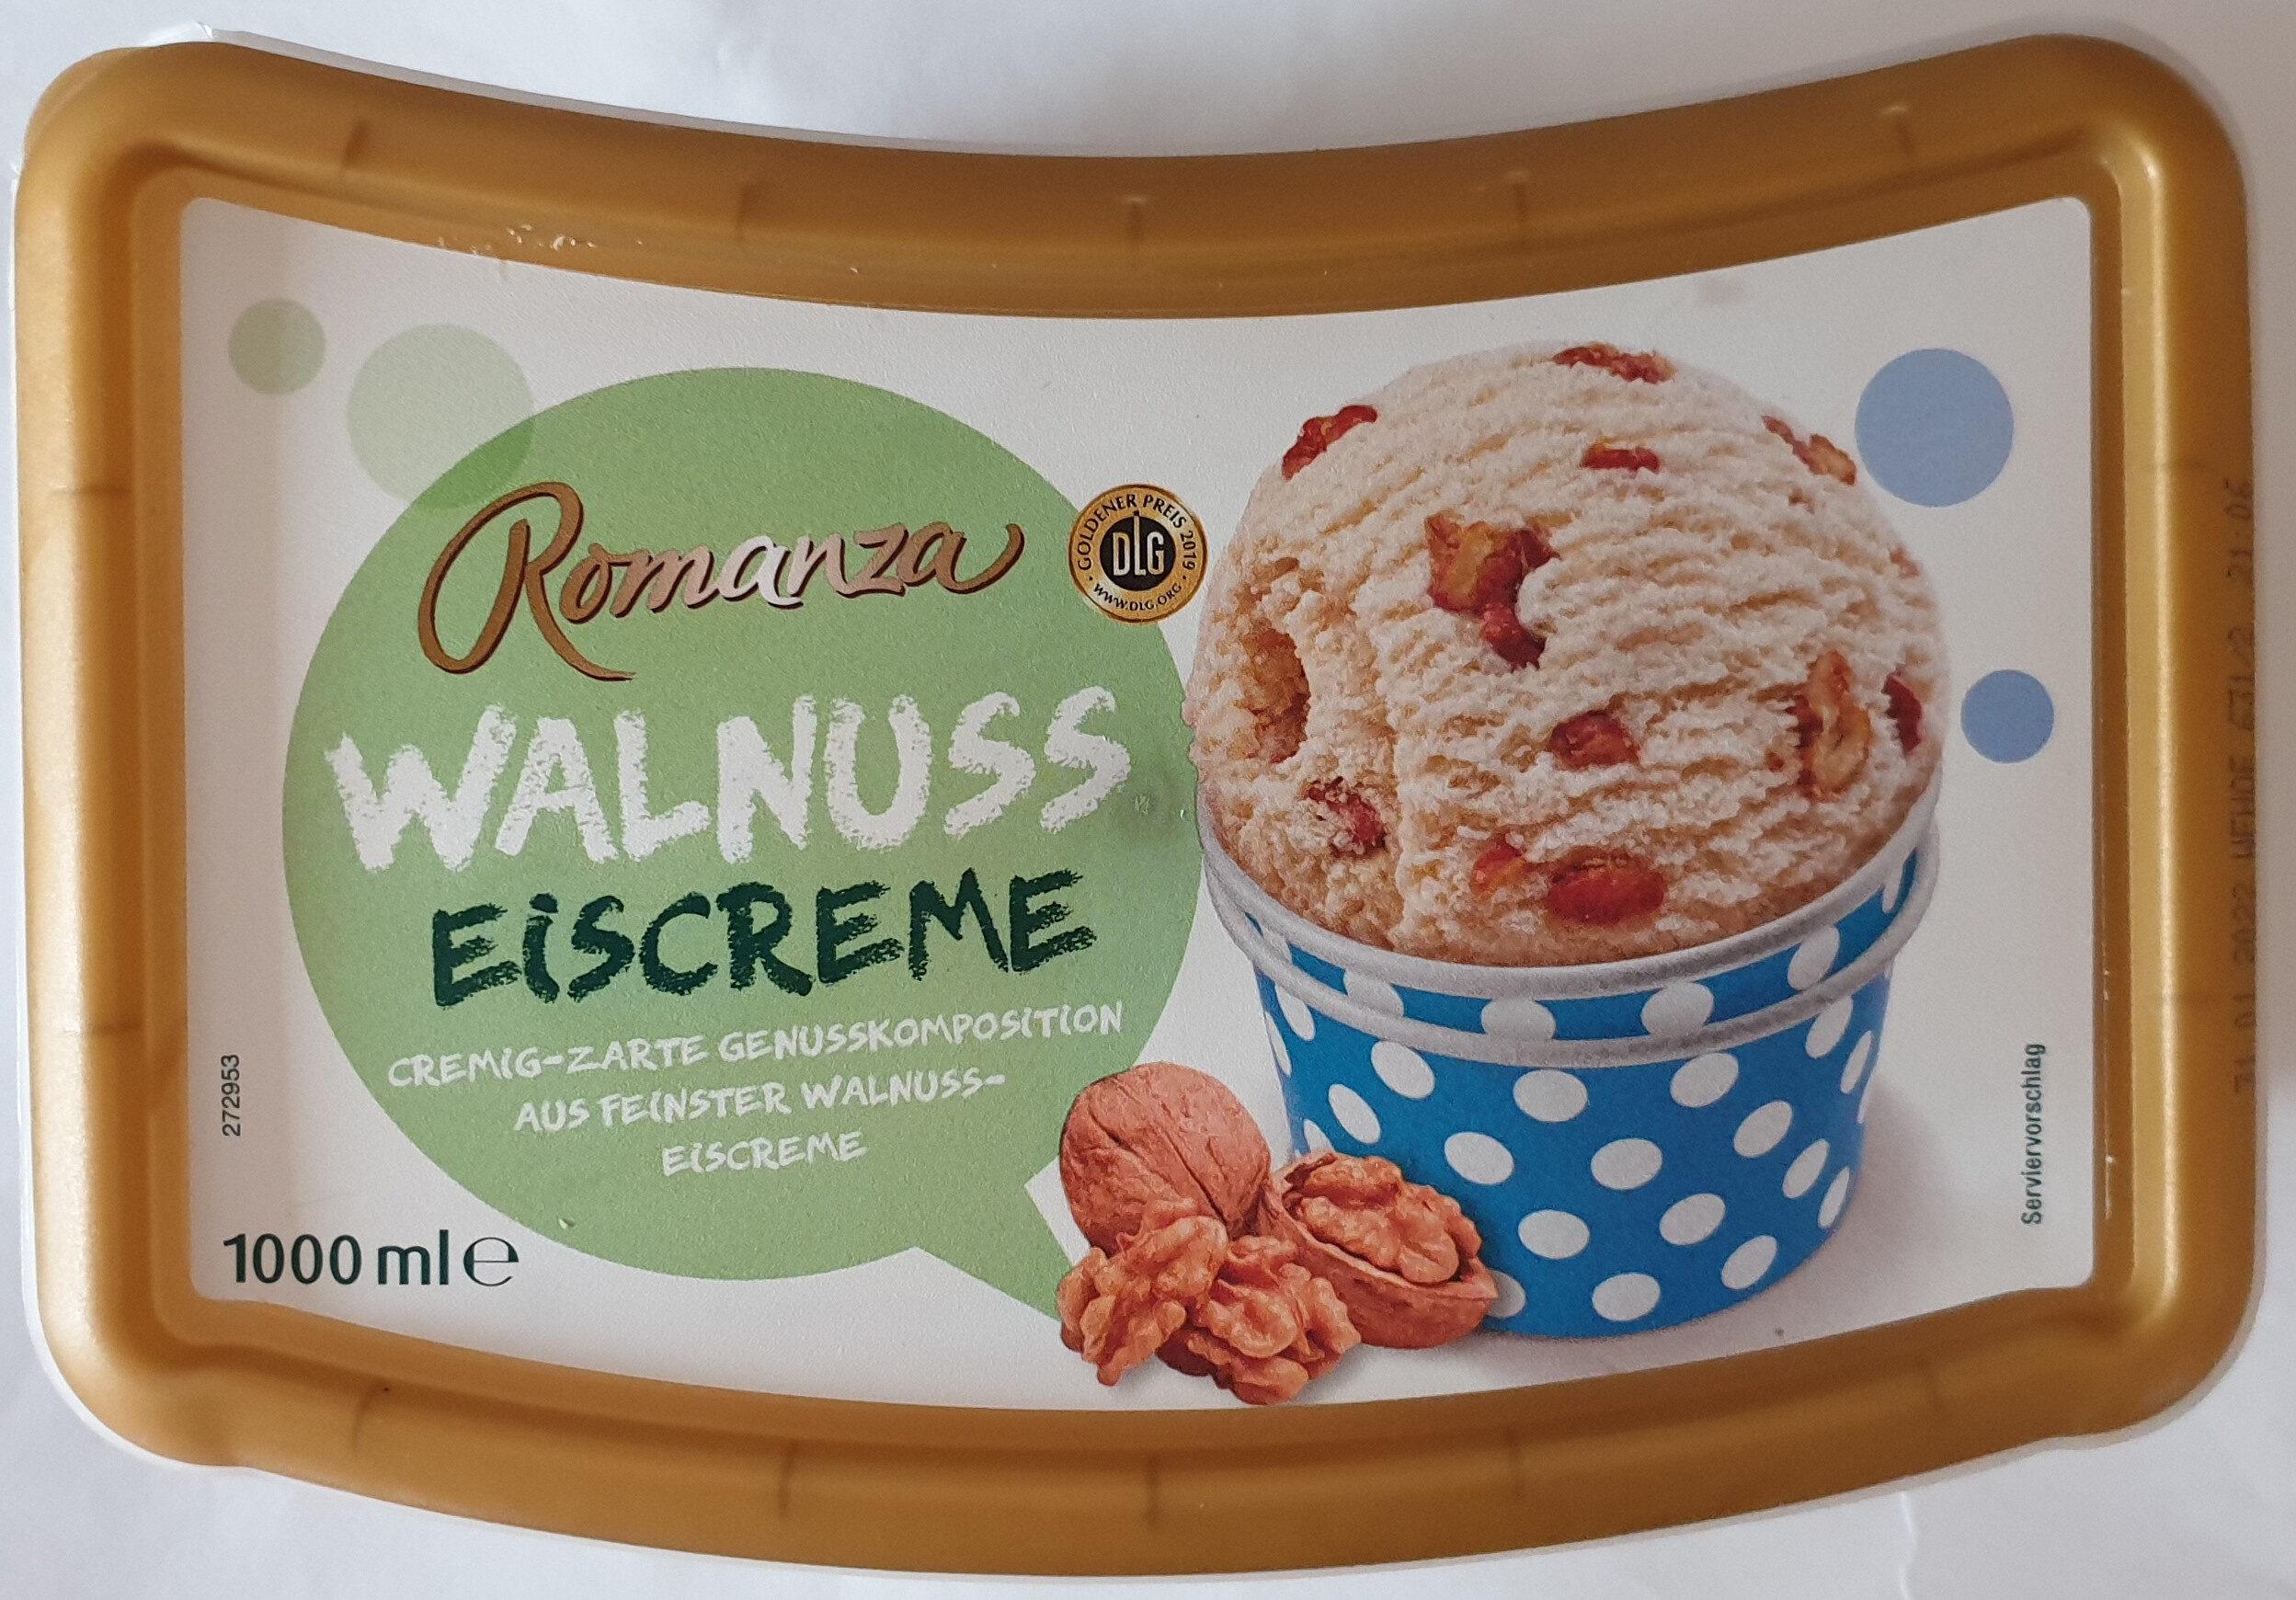 Walnuss Eiscreme - Product - de